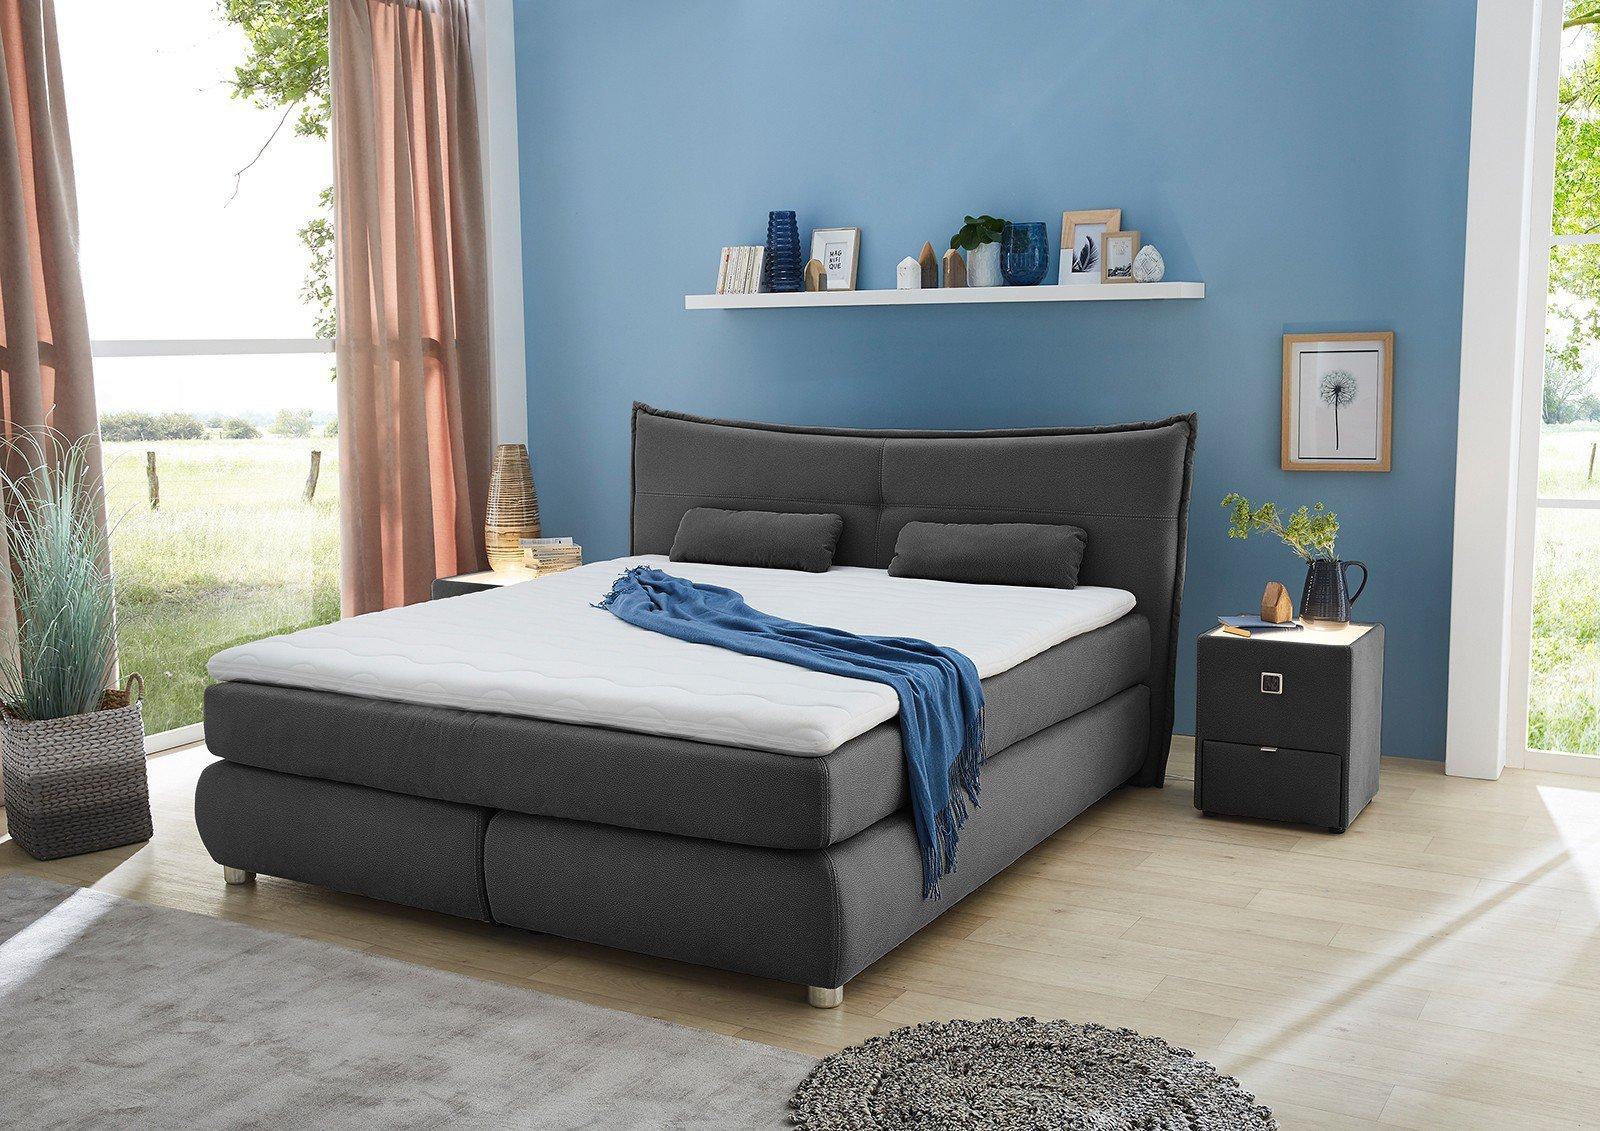 boxspringbett venetia veronika von jockenh fer inklusive. Black Bedroom Furniture Sets. Home Design Ideas